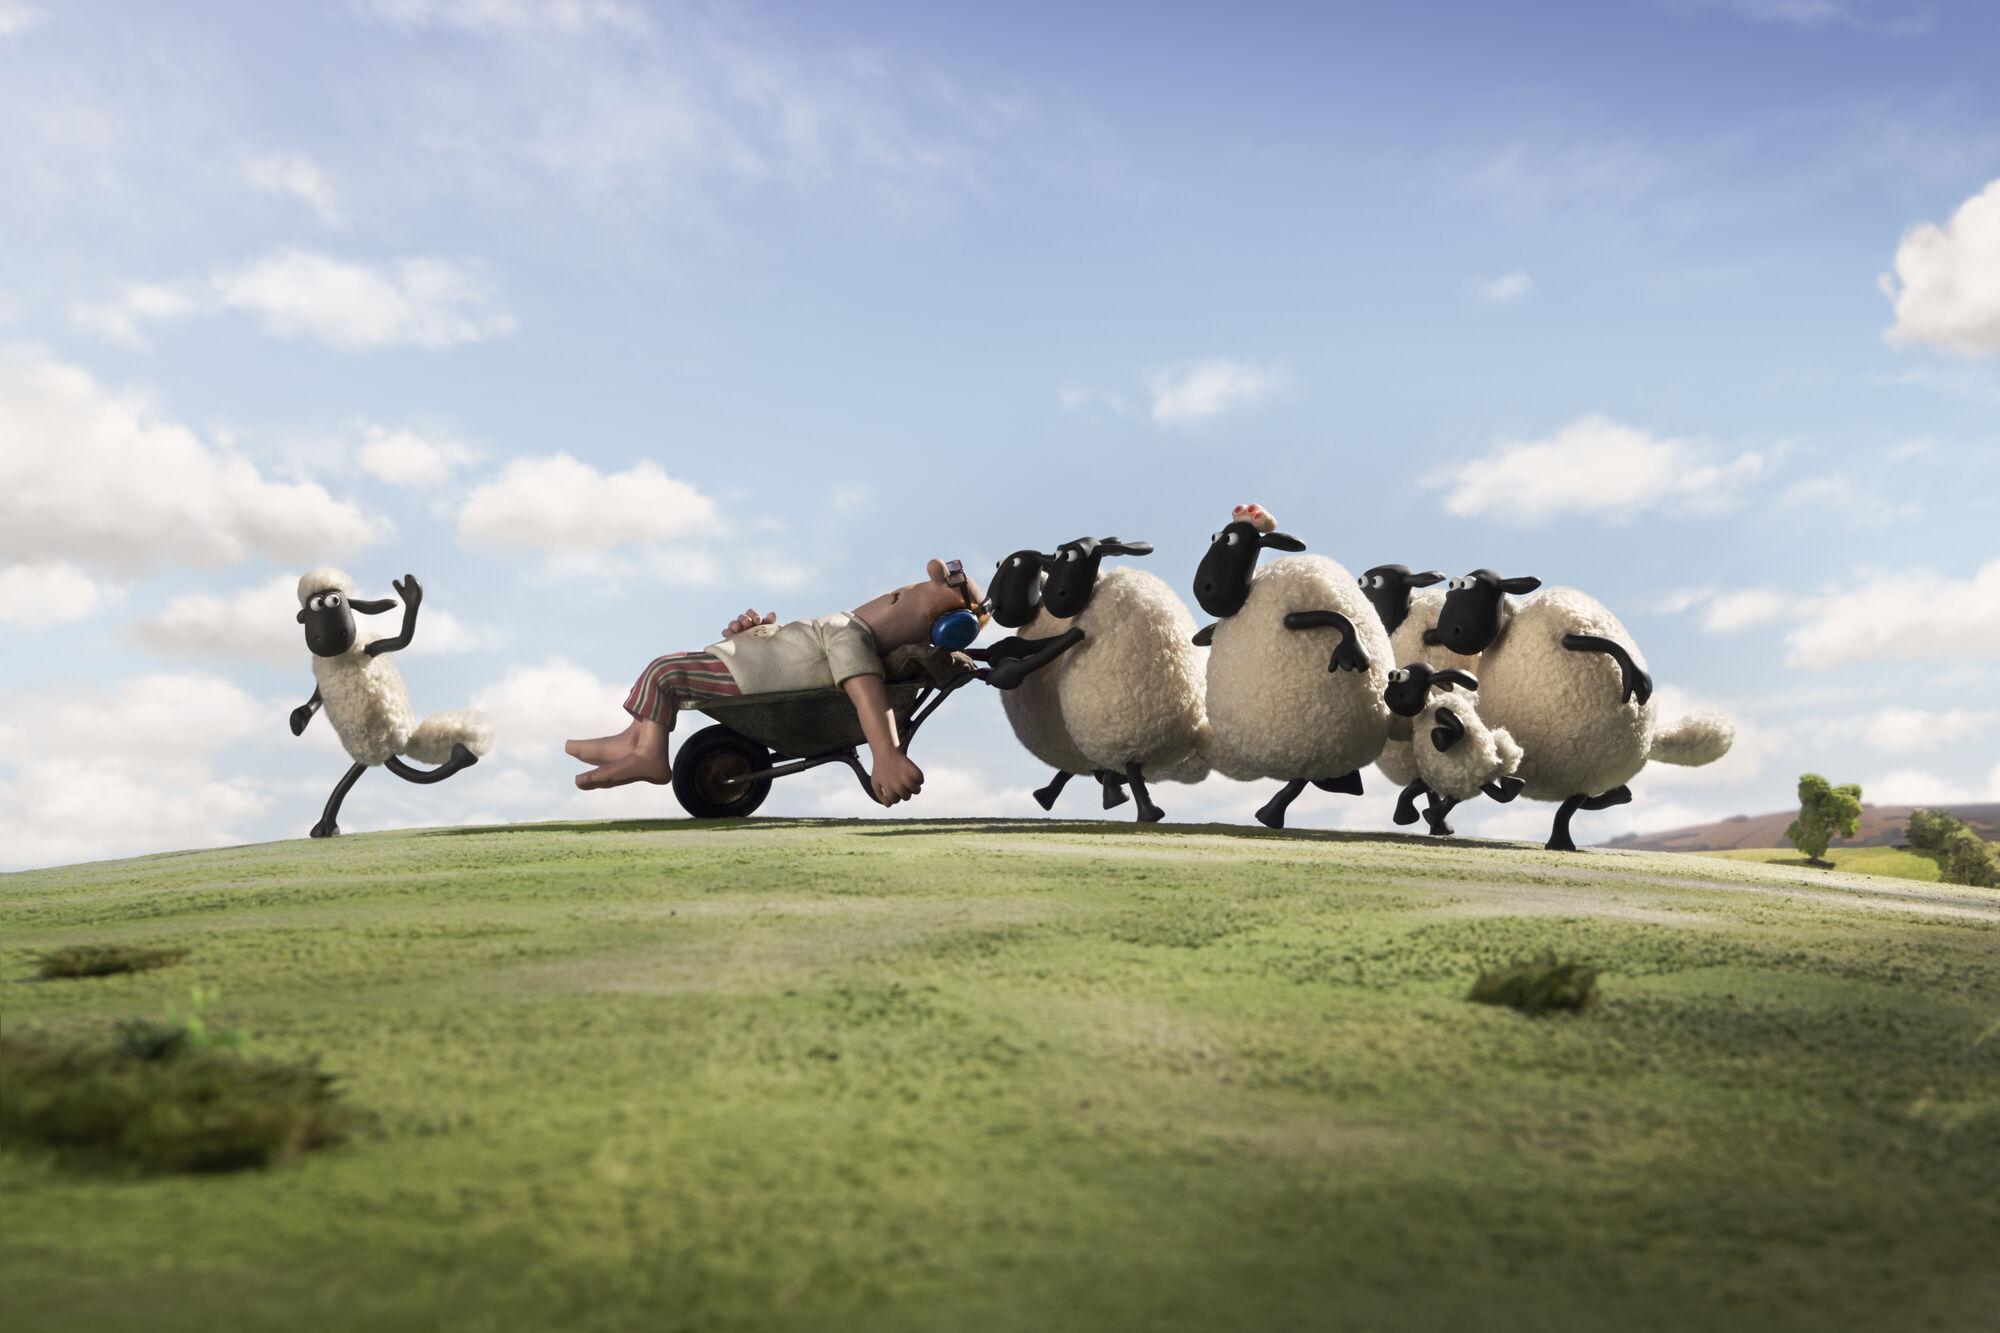 shaun the sheep movie moviepedia fandom powered by wikia